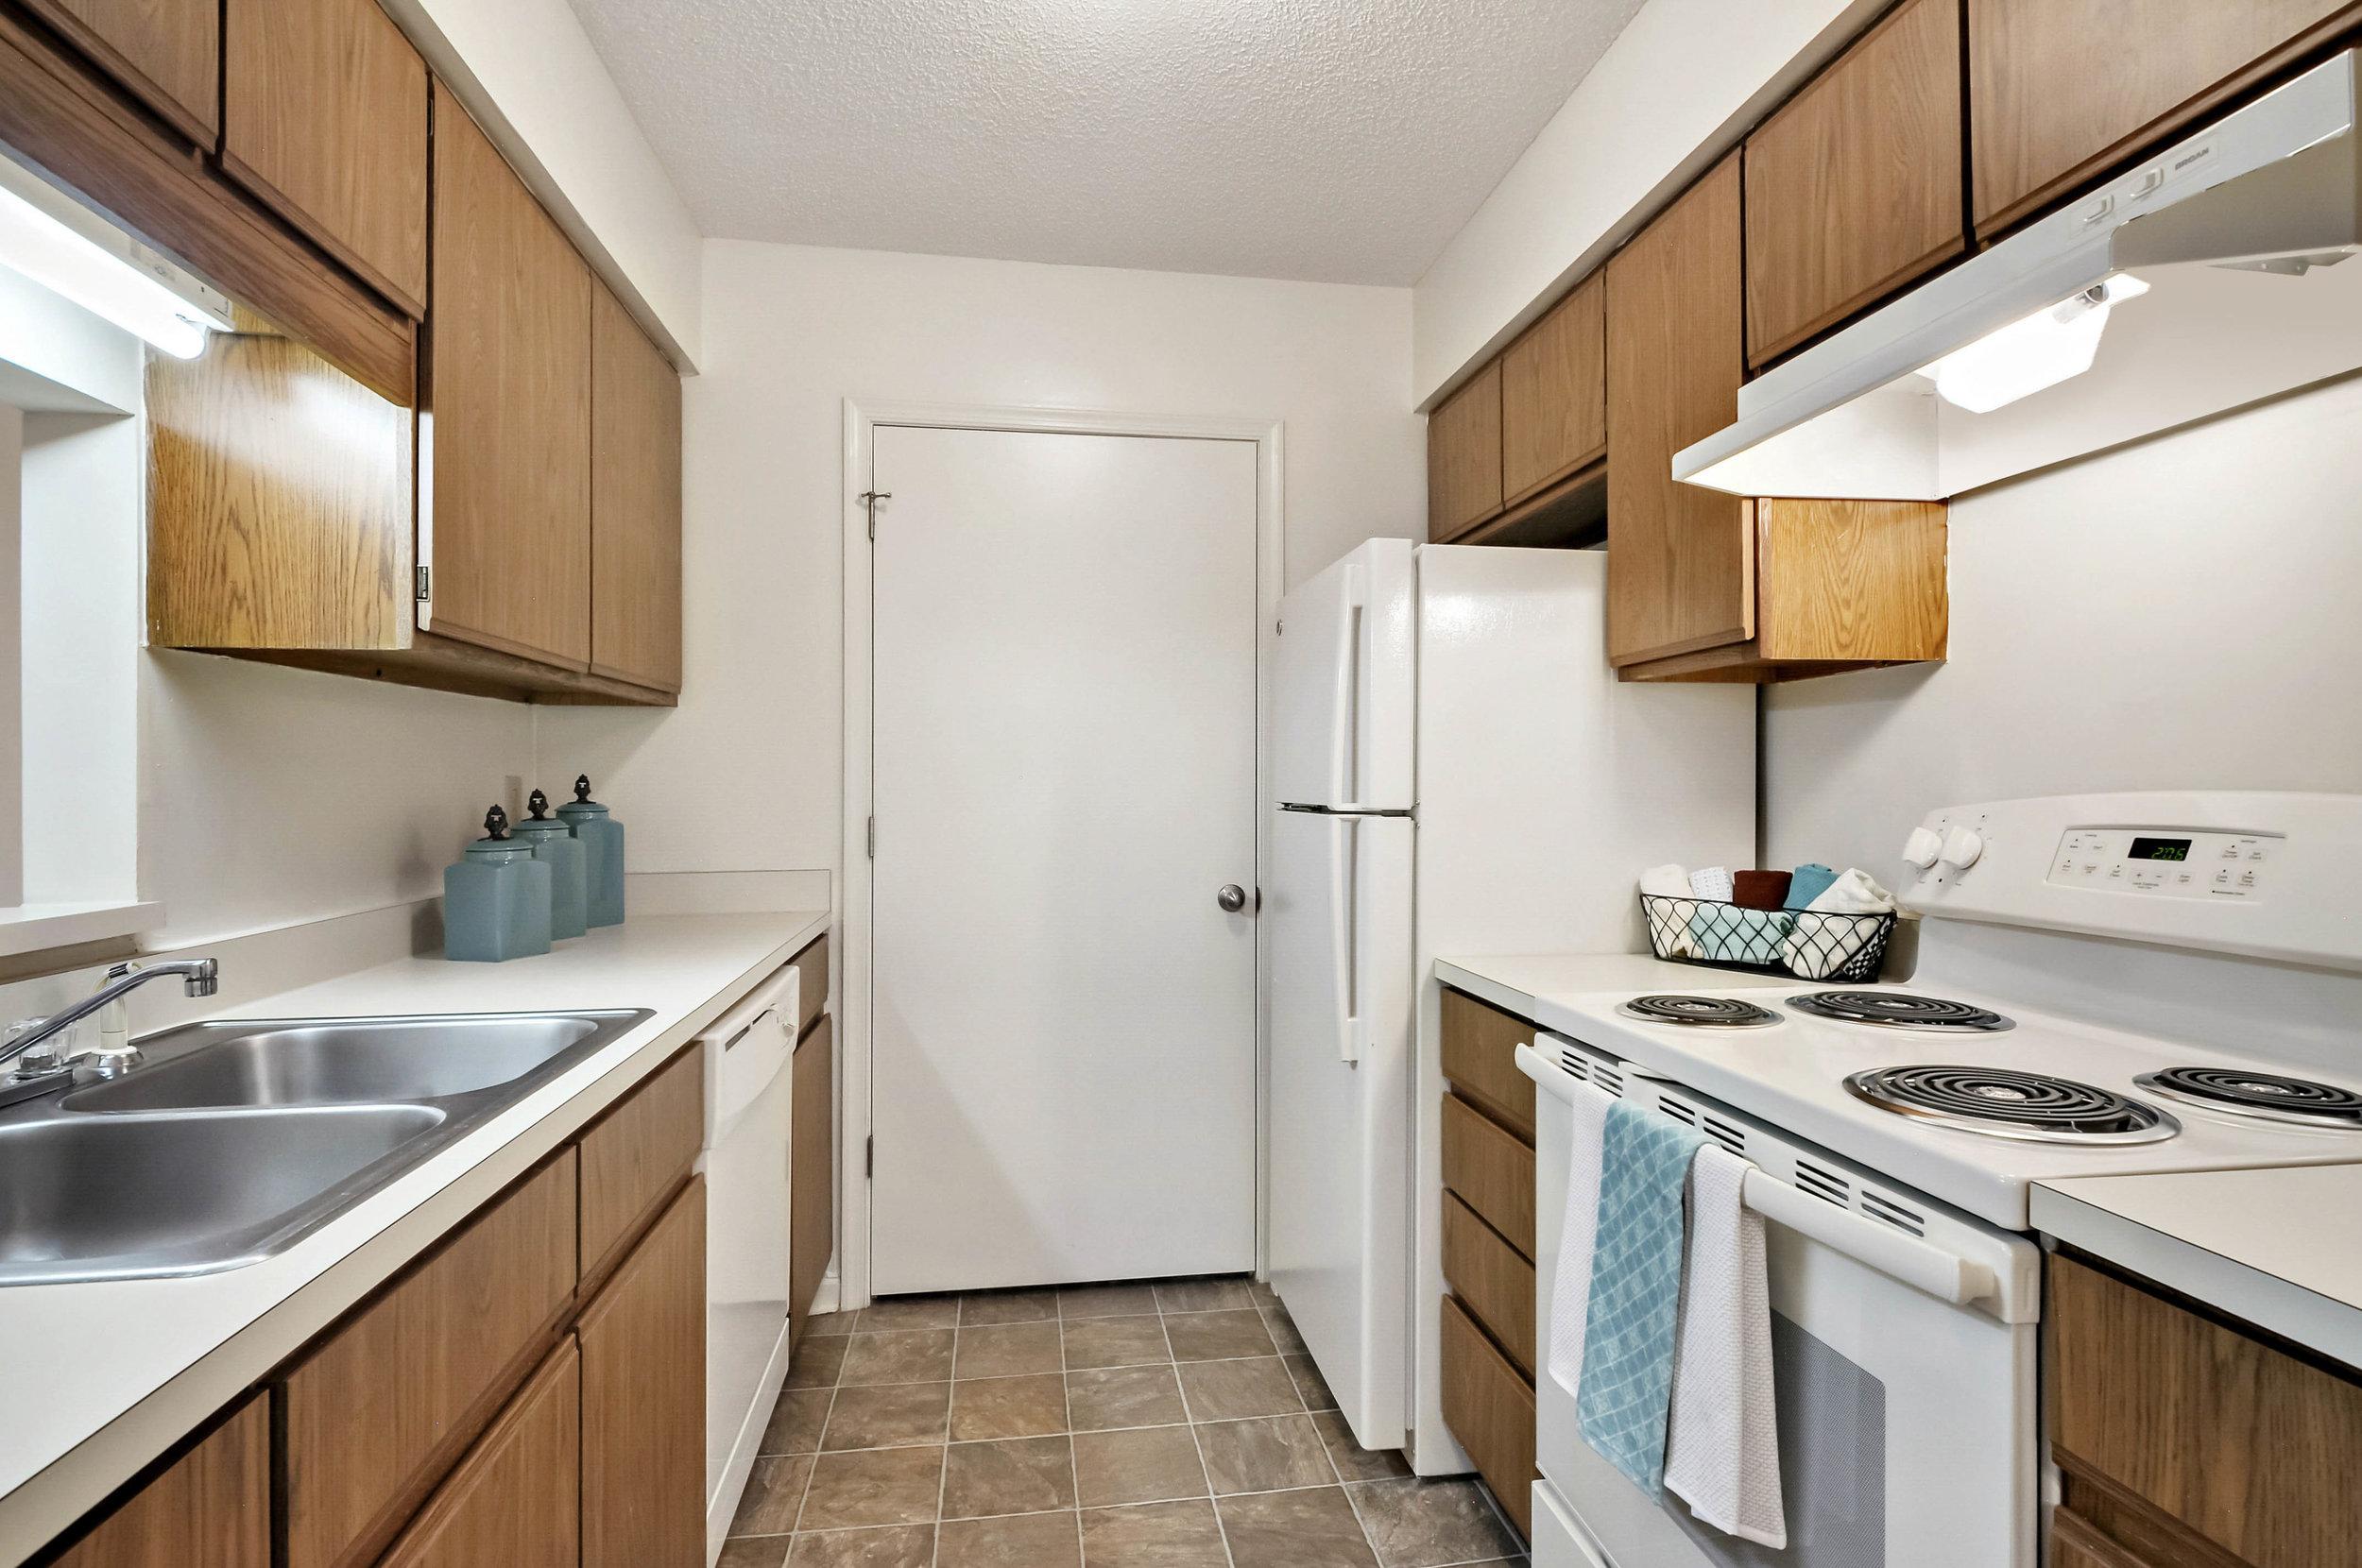 Kitchen-Wildwood-Trace-Rocky-Mount-NC-PJ03159-PH-20 2.JPG